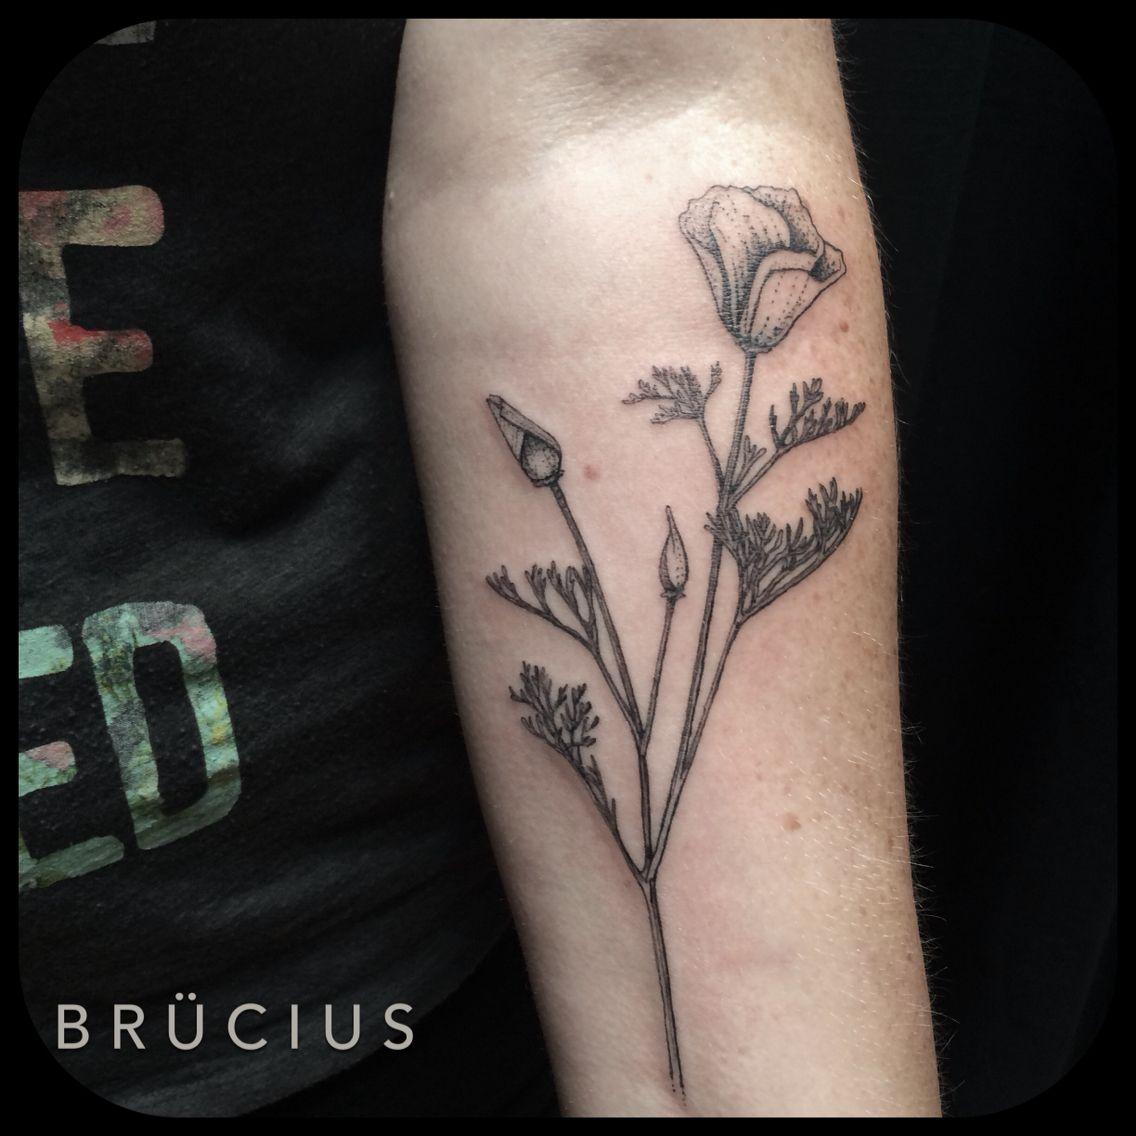 f8eb6e166 #BRÜCIUS #TATTOO #SF #SanFrancisco #brucius #natural #science #engraving  #etching #sculptoroflines #dotwork #blackwork #penandink #lines  ##california #poppy